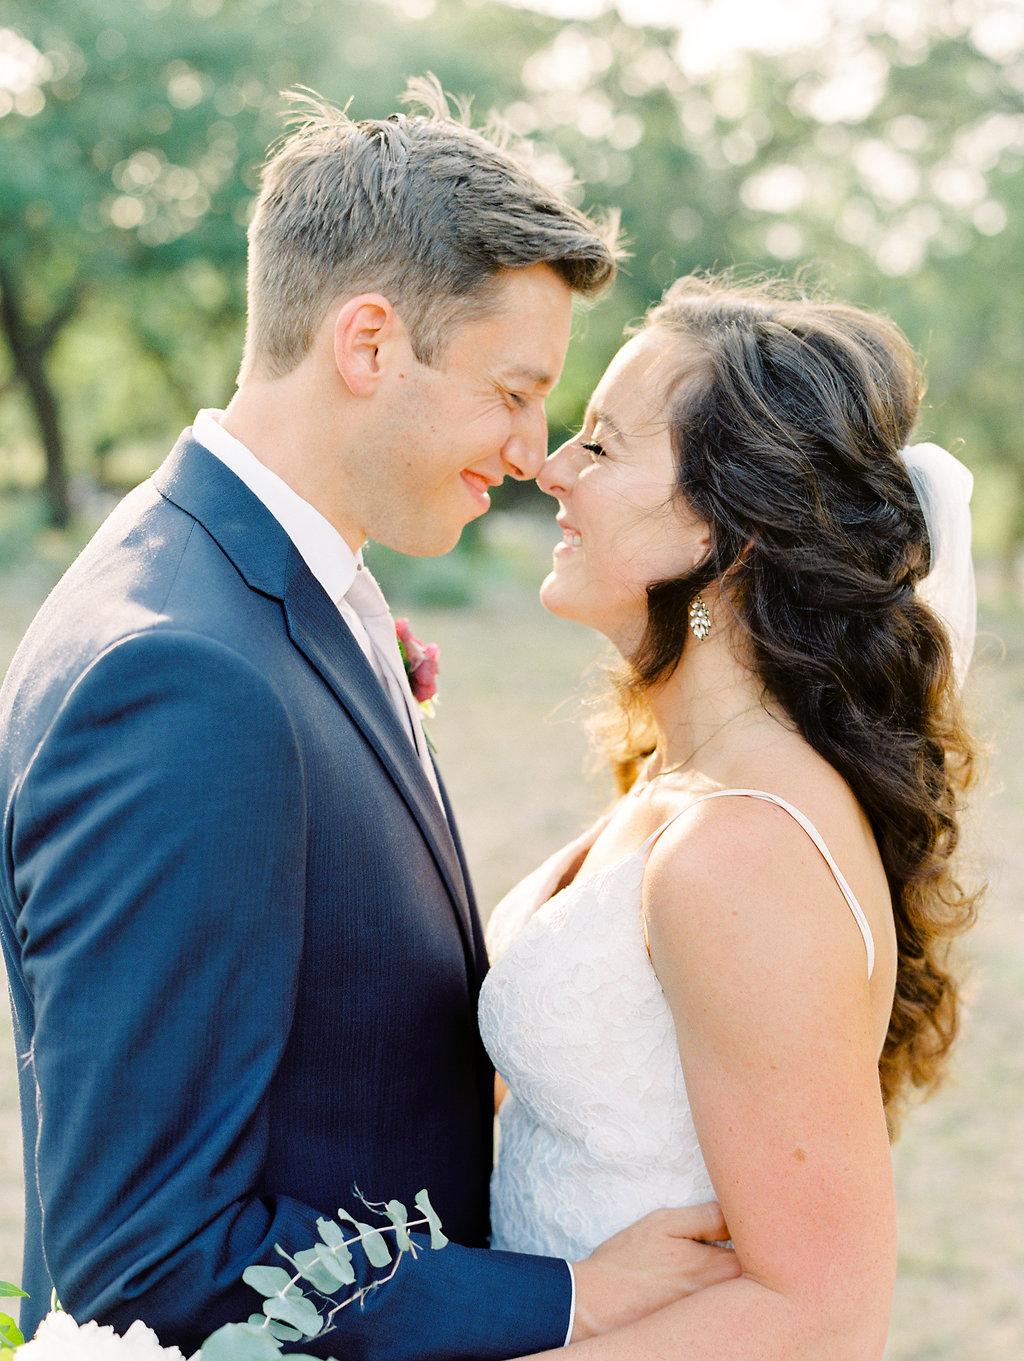 Best-Austin-Denver-California-Wedding-Photographers-fine-art-film-Park-31-48.jpg